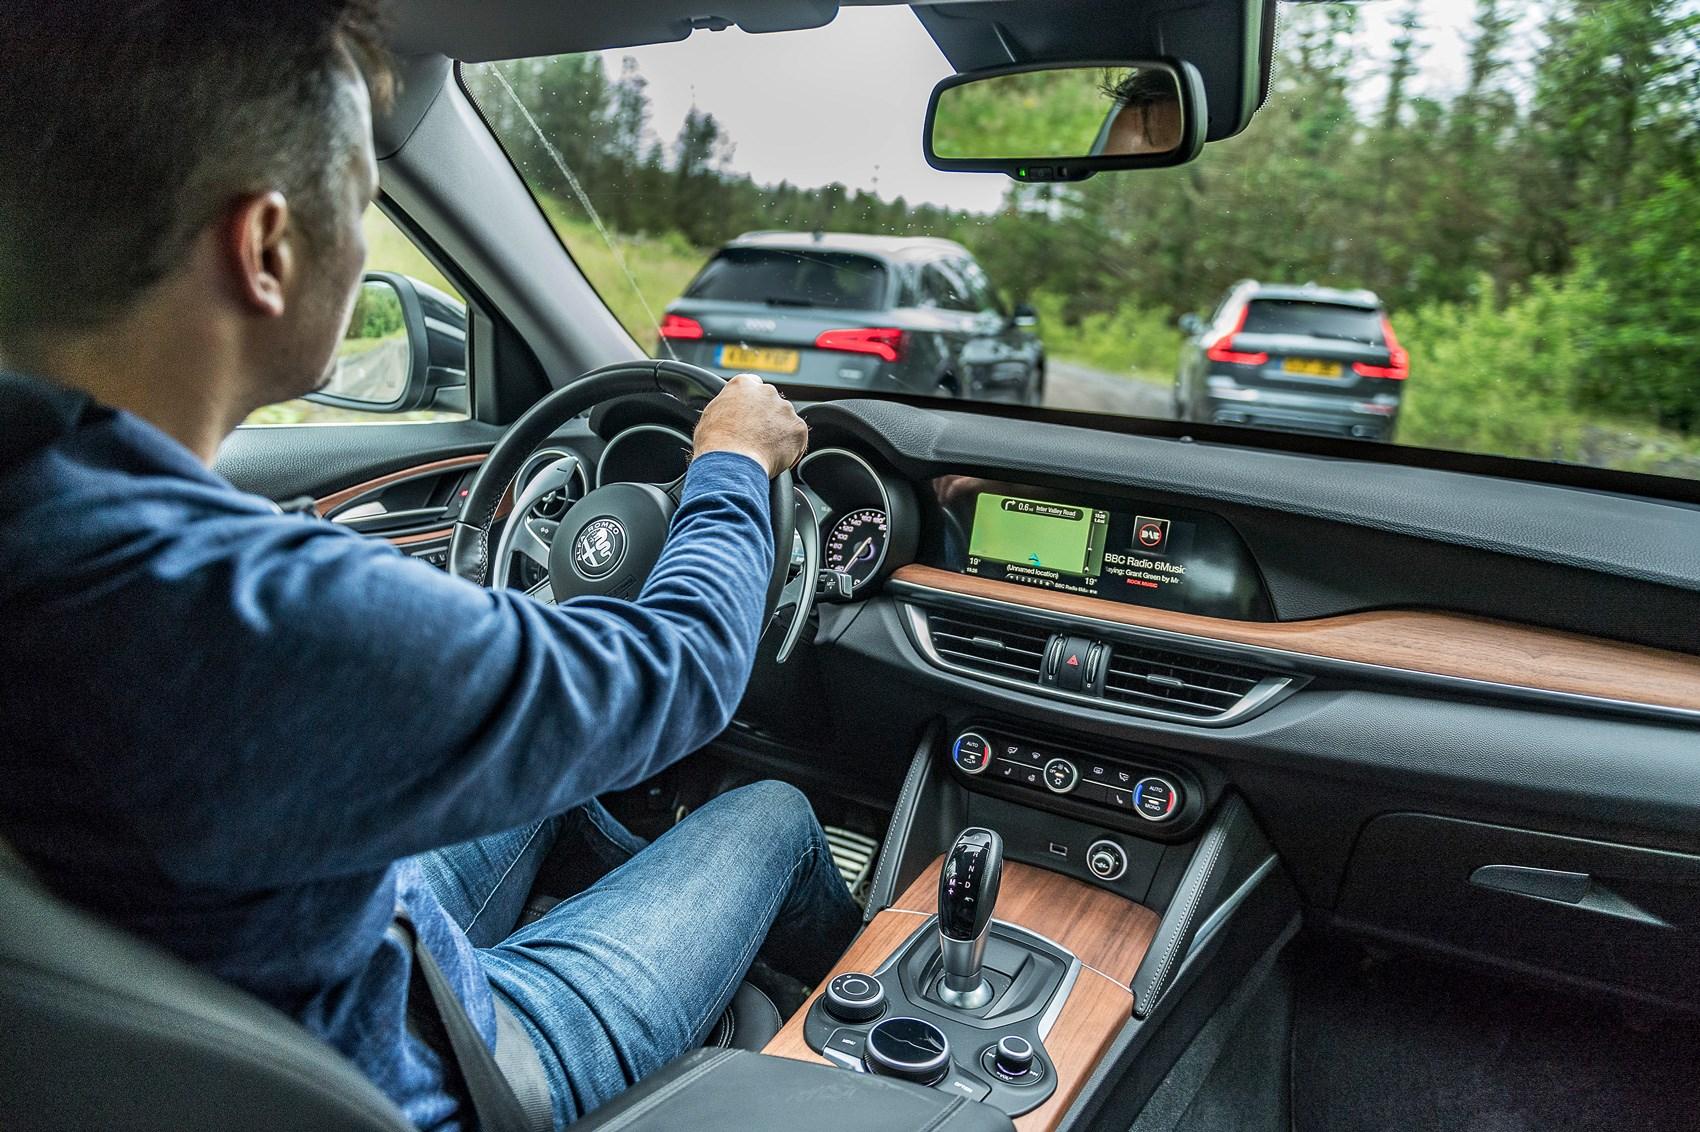 Alfa Romeo Stelvio Vs Volvo Xc60 Vs Audi Q5 Triple Test Review Car